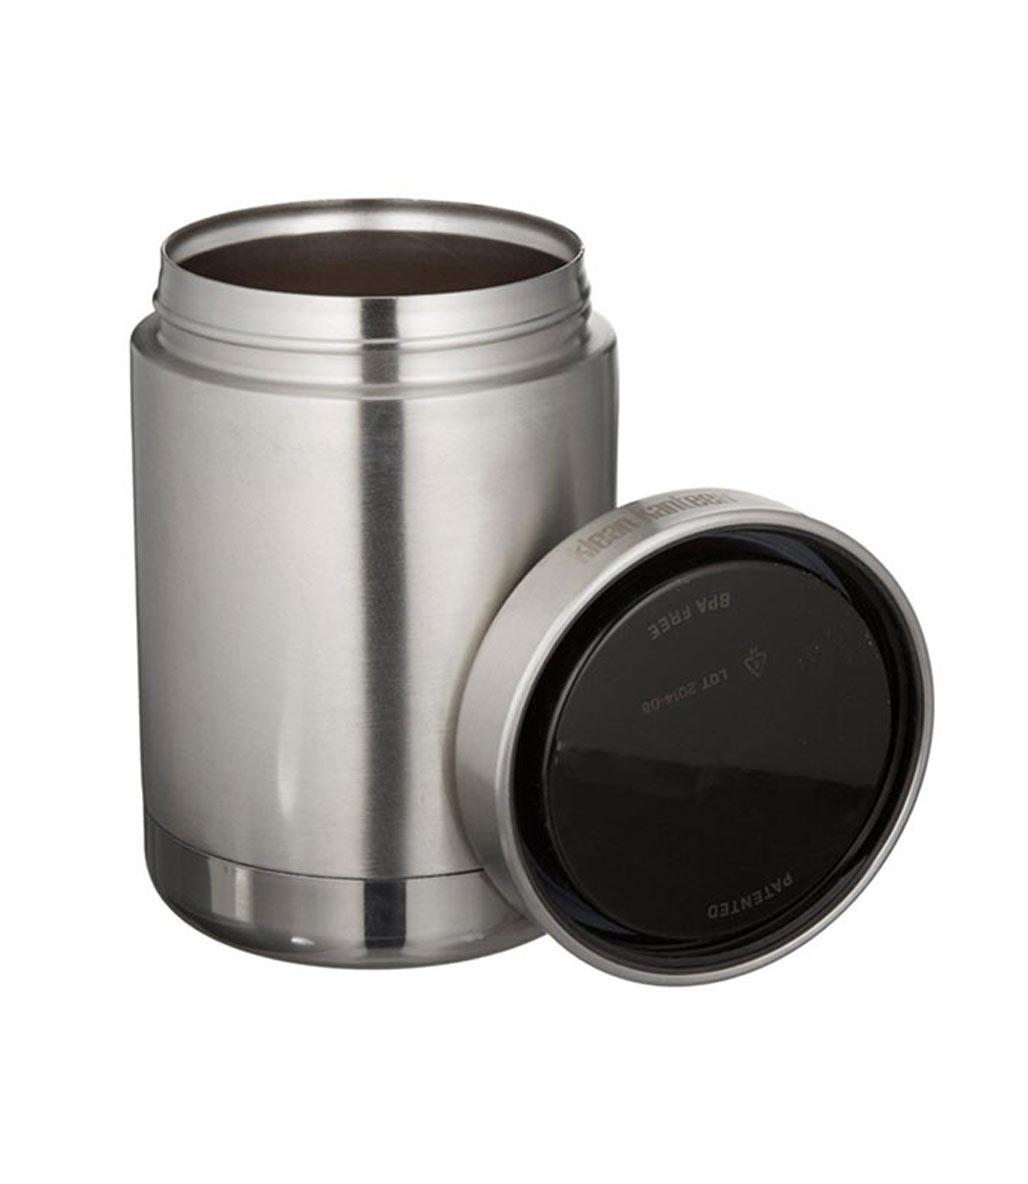 Klean Kanteen Insulated Food Canister Yemek Termosu 473 ml Gri